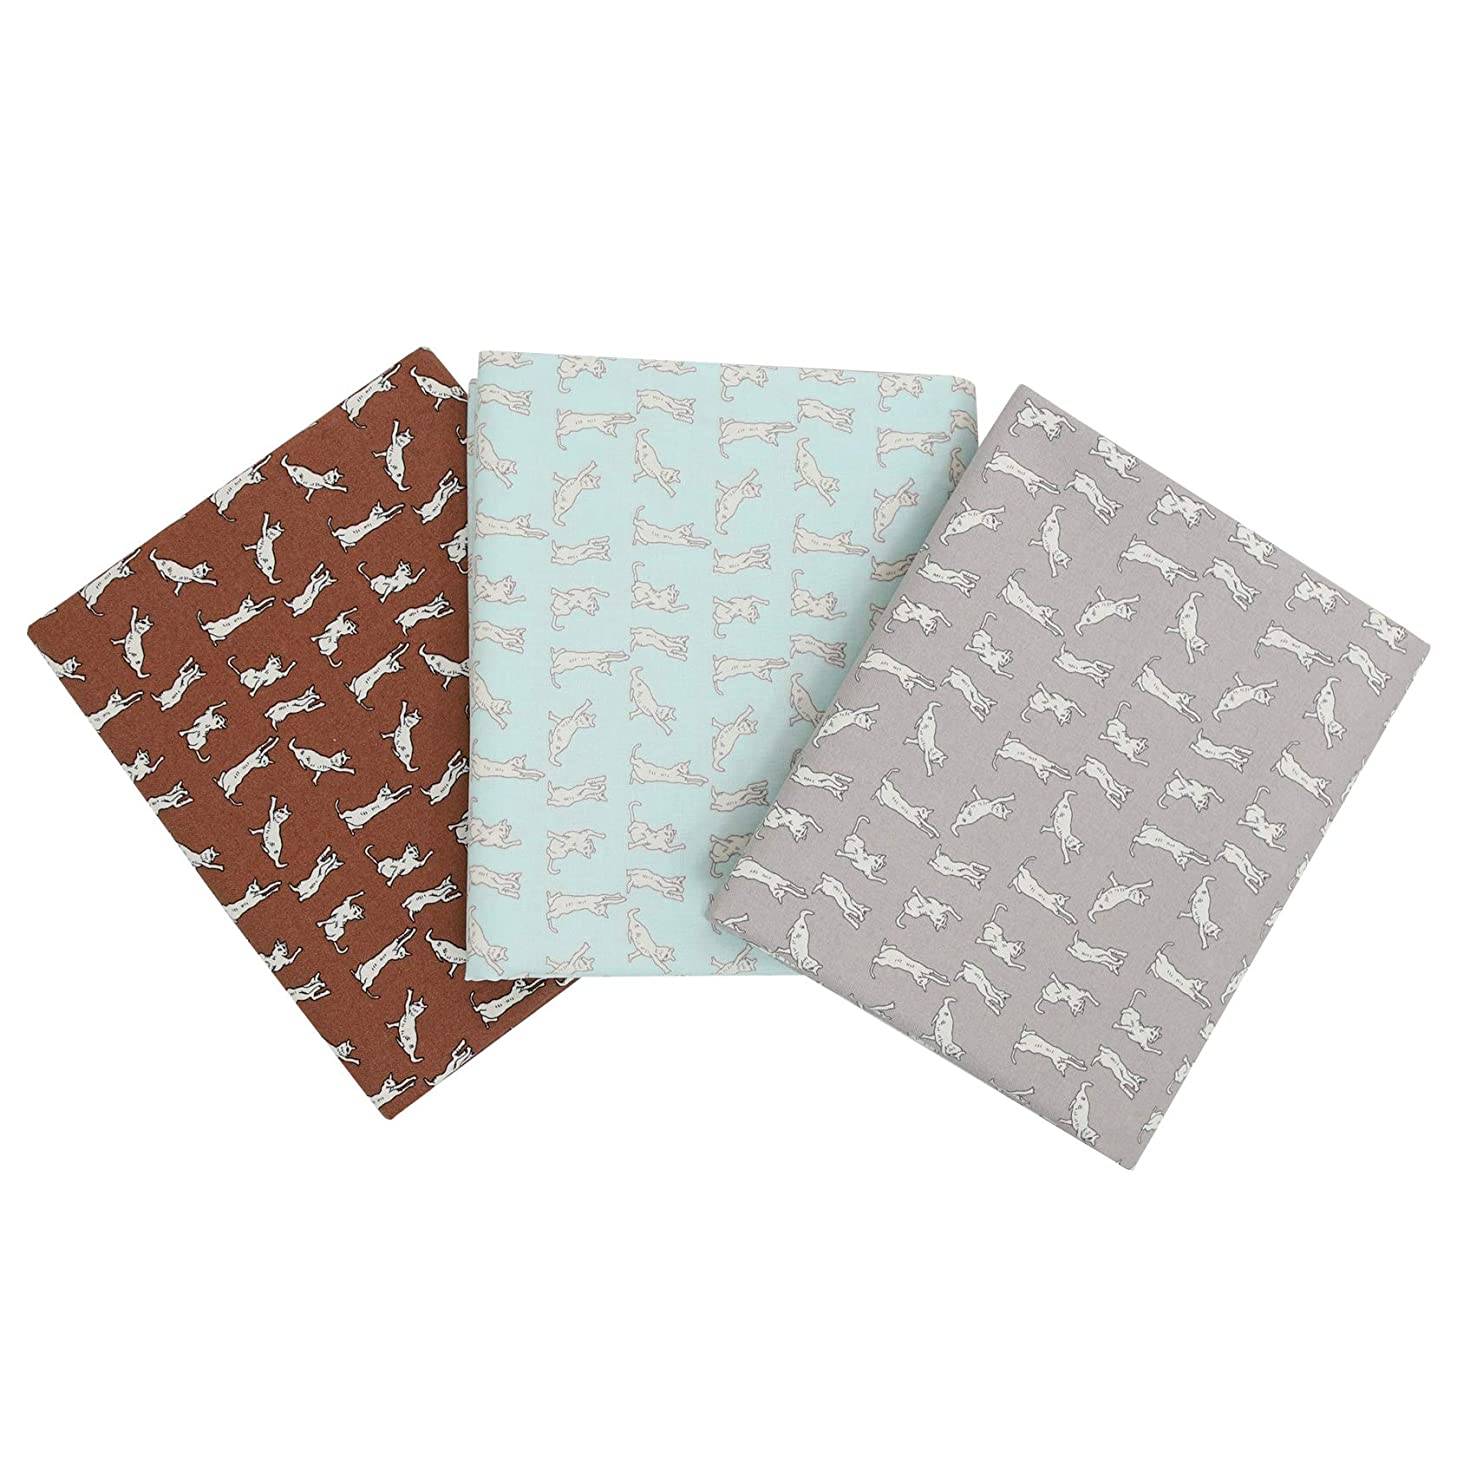 COTTONVILL Organic Cotton Siamese cat Pattern Quilting Fabric 3yds